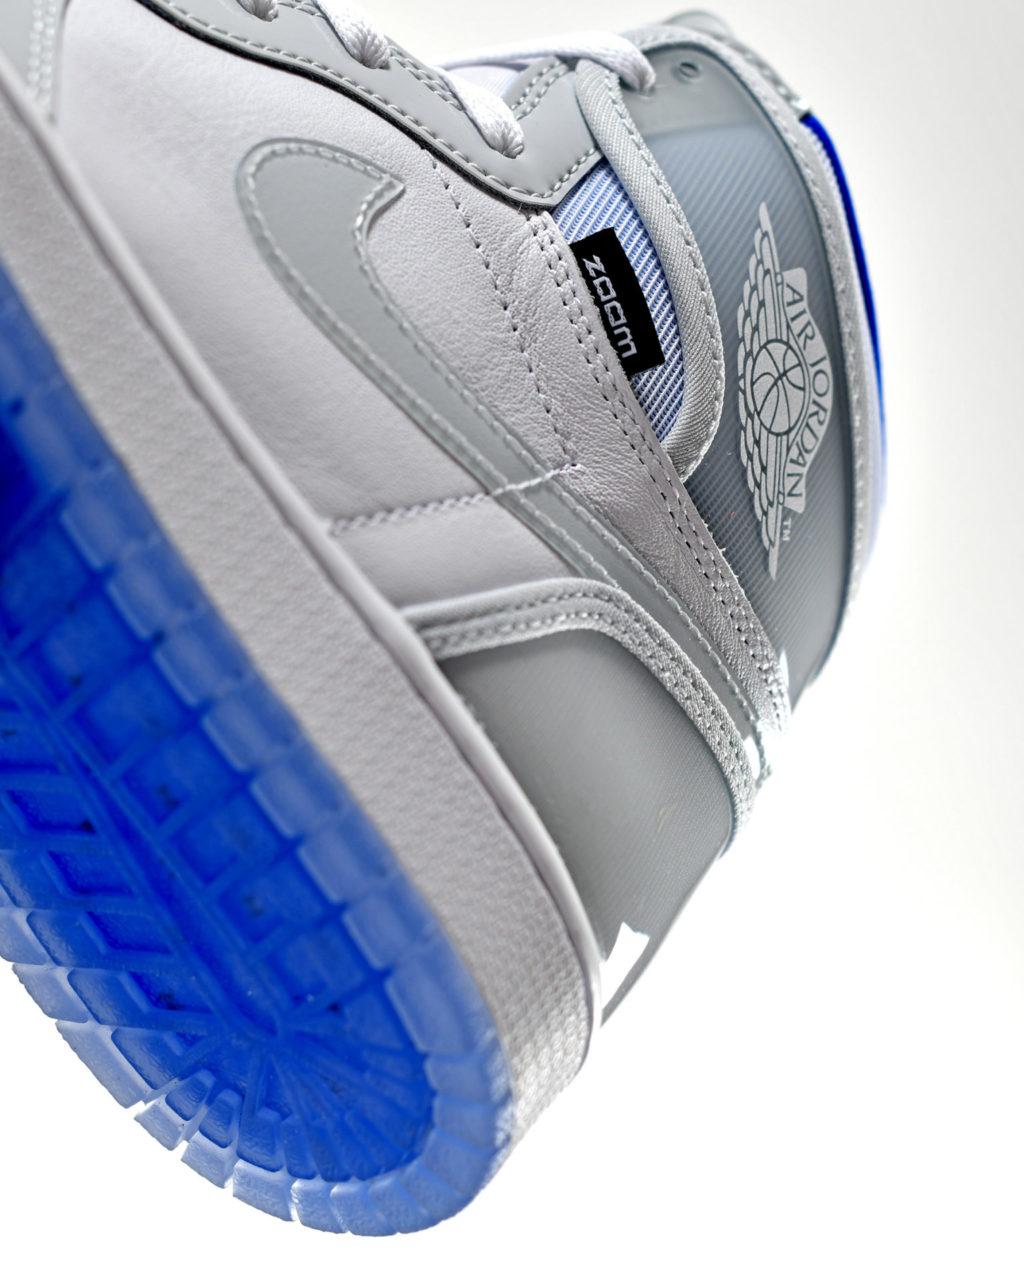 Air Jordan 1 Zoom High Racer Blue